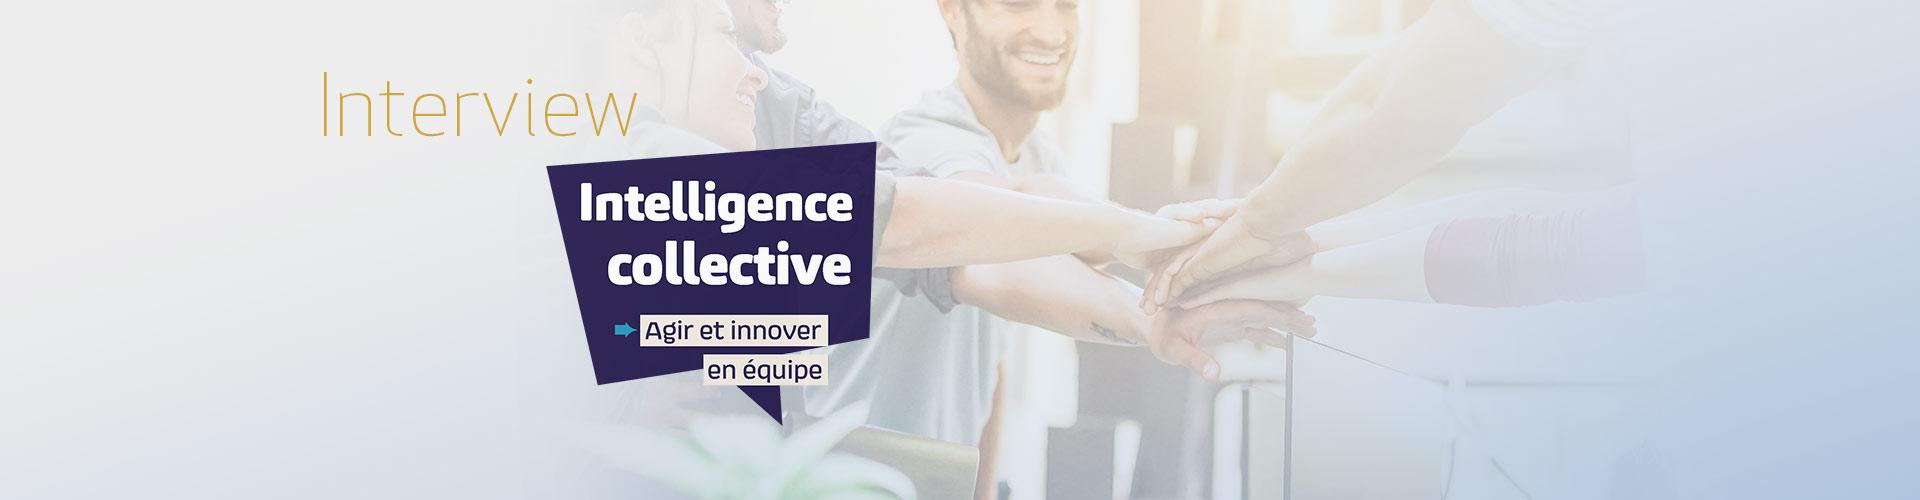 Interview : Intelligence collective, un état d'esprit